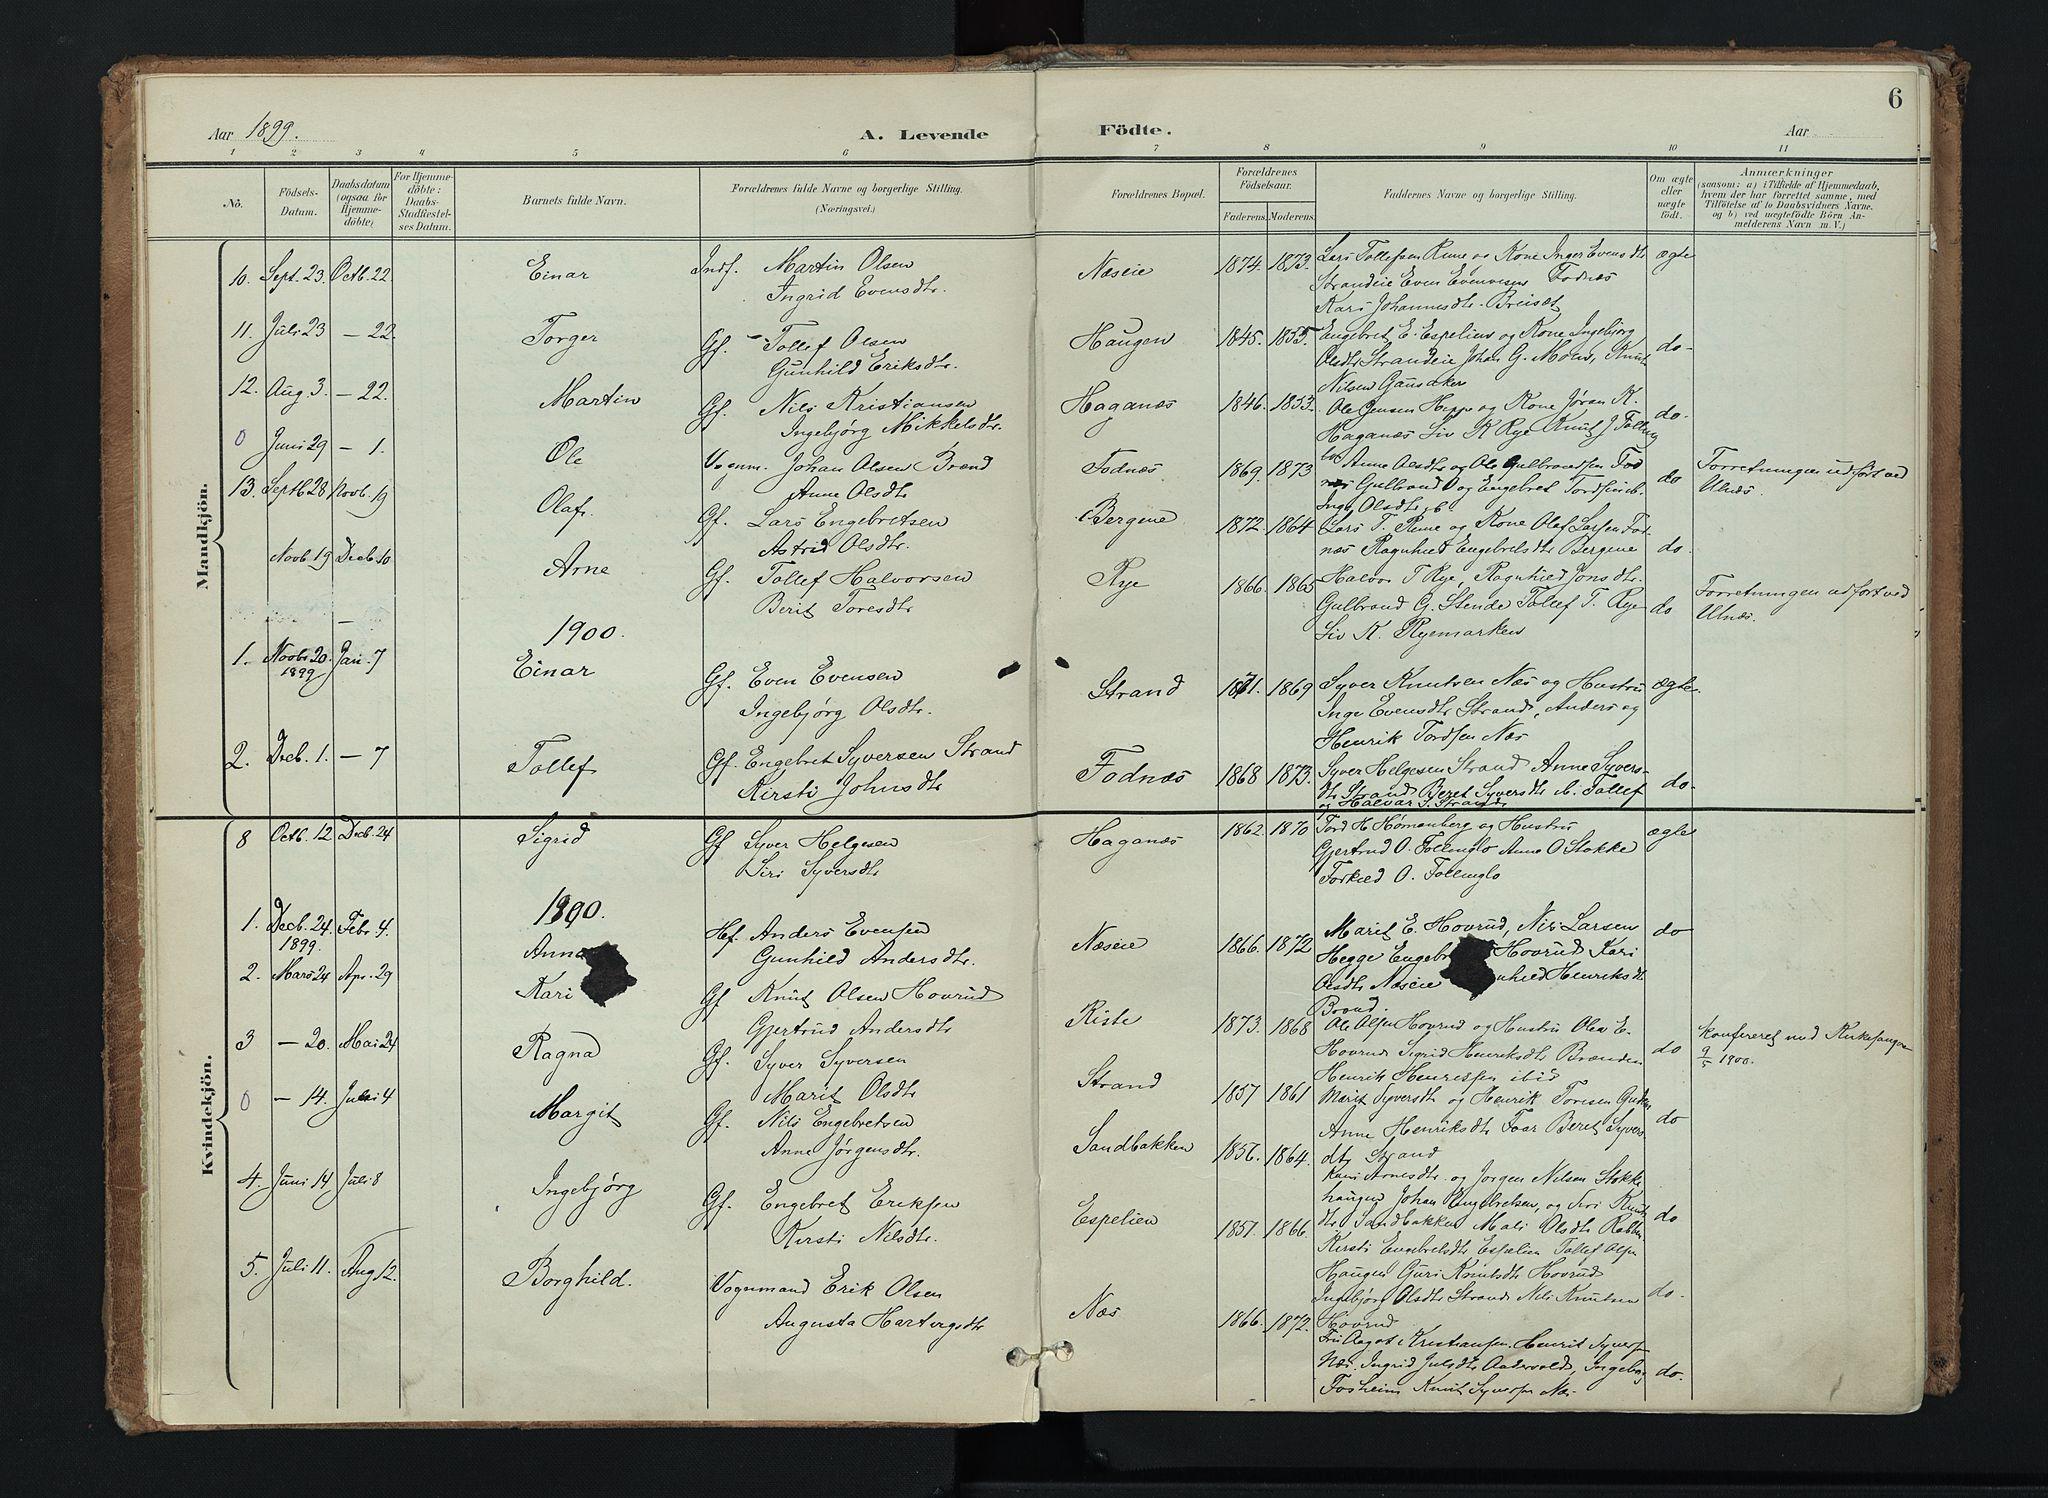 SAH, Nord-Aurdal prestekontor, Ministerialbok nr. 16, 1897-1925, s. 6